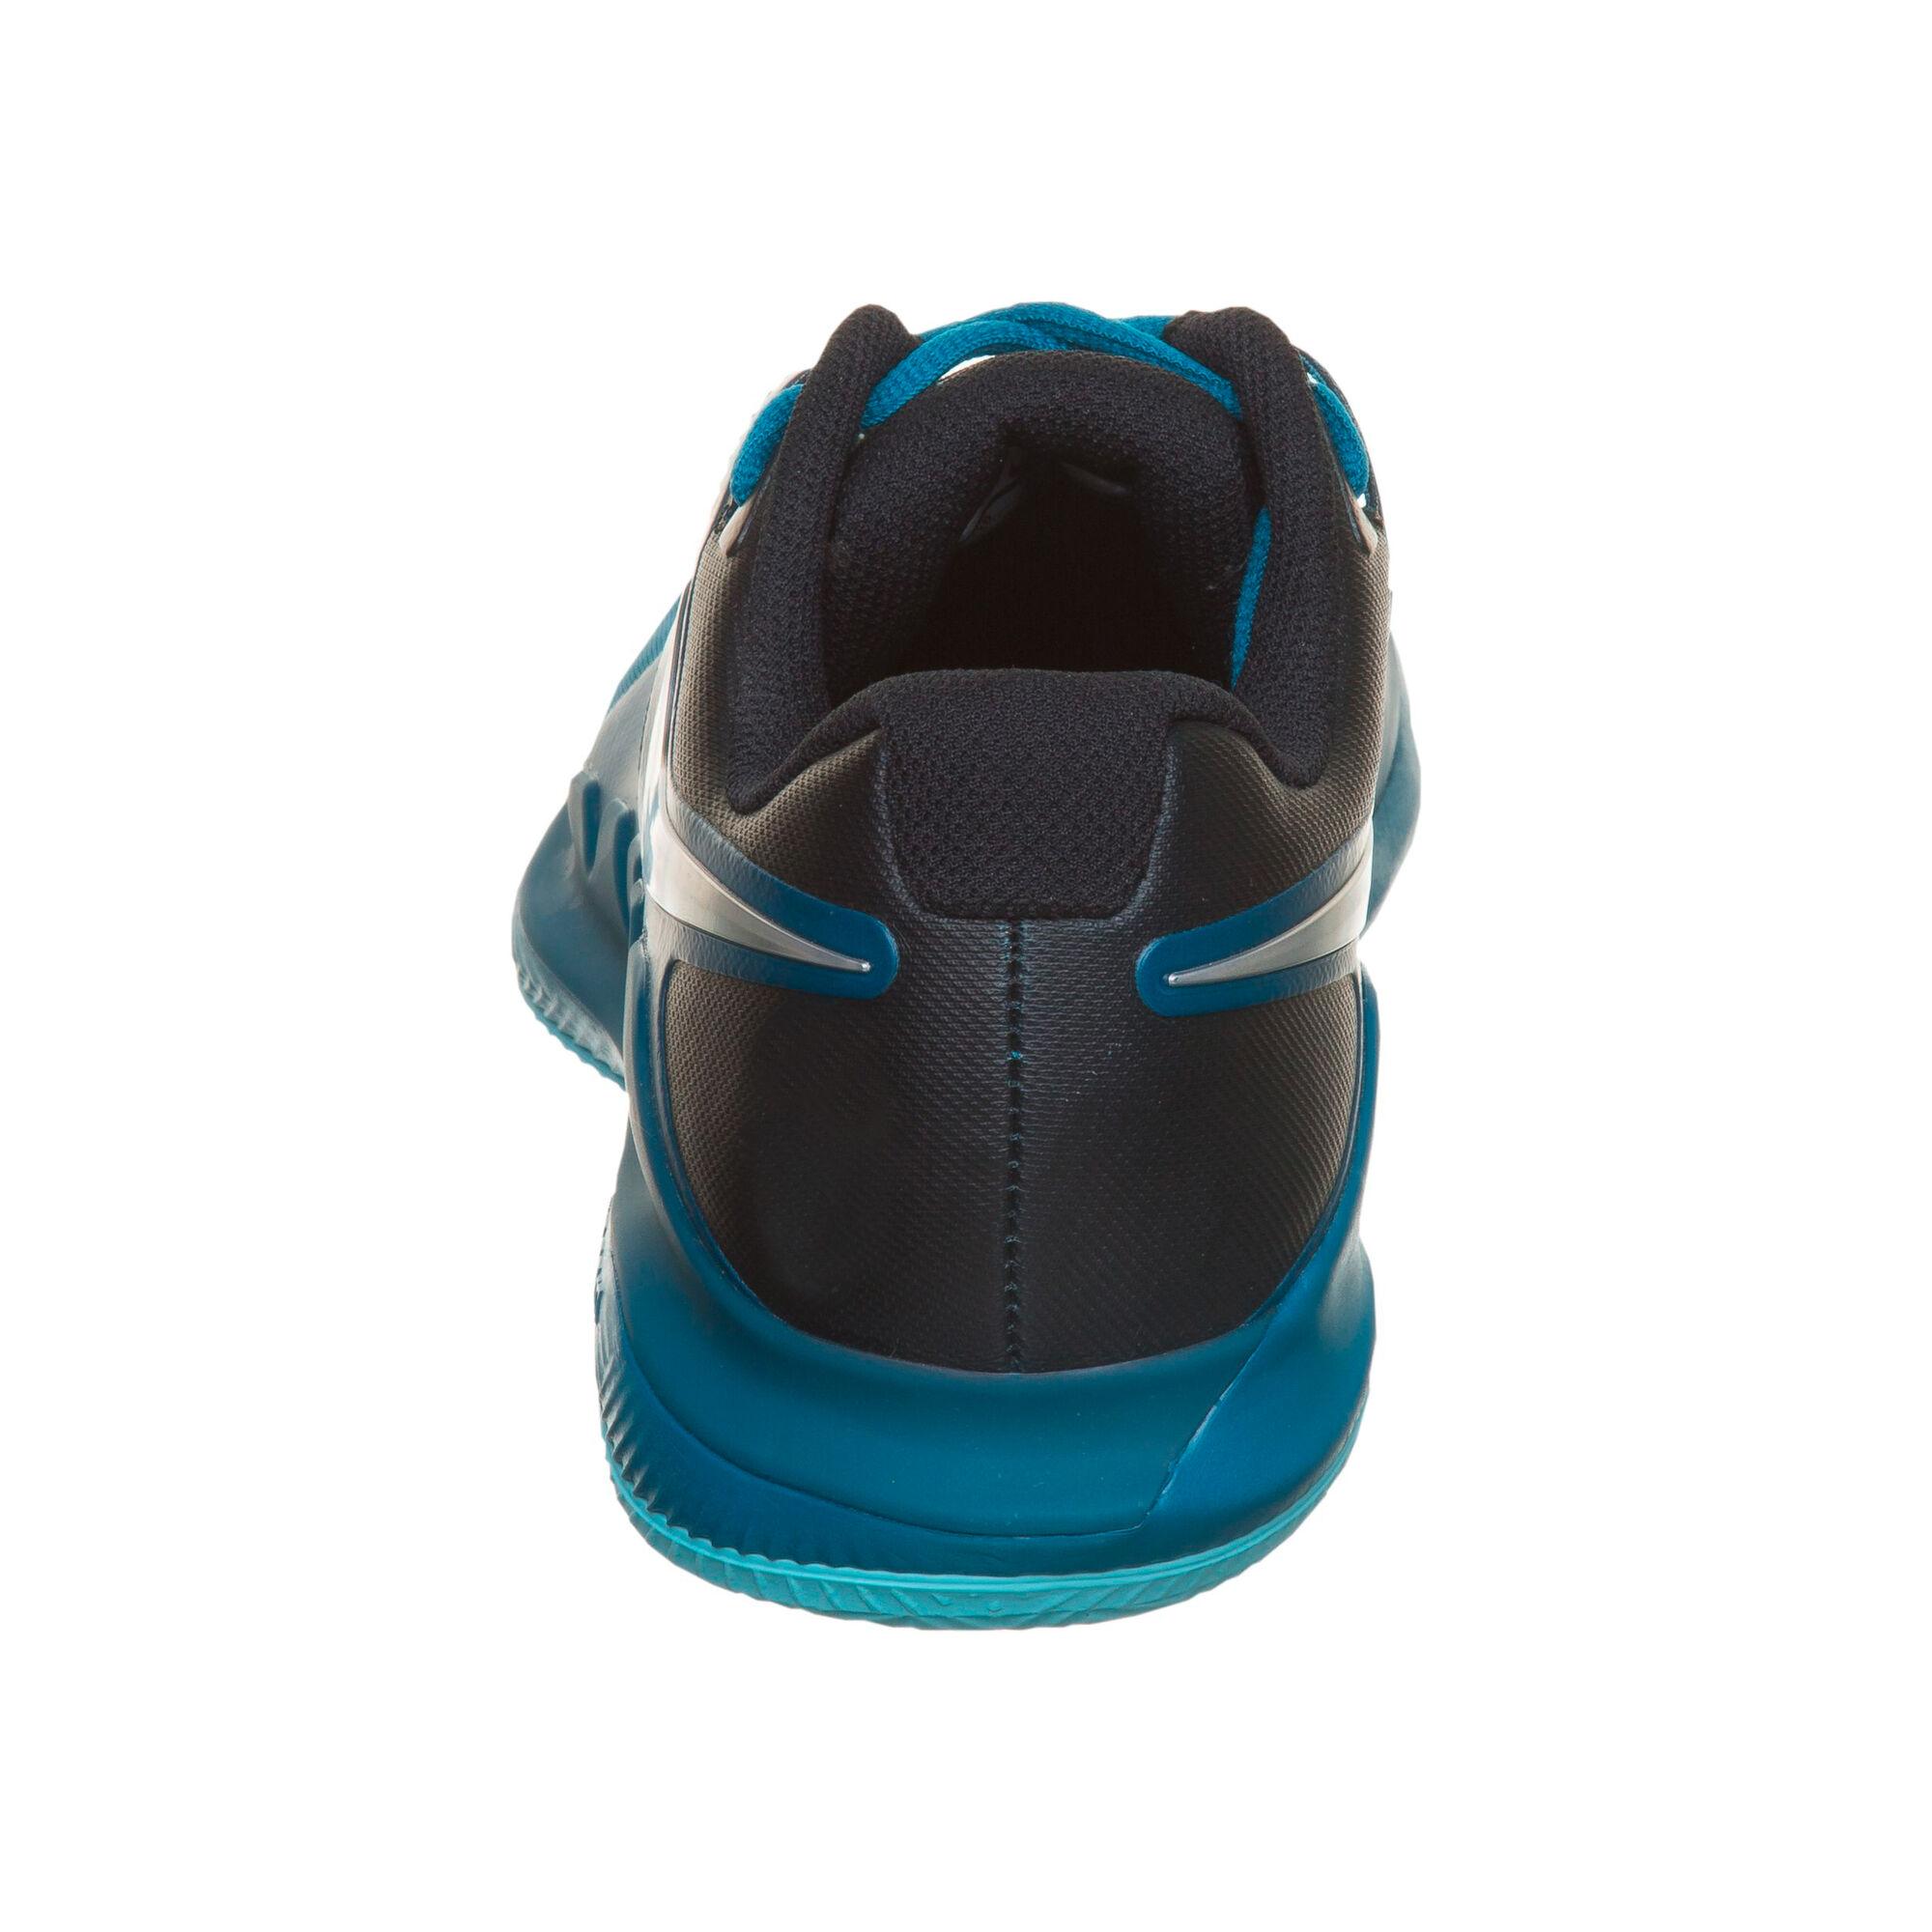 check out 71a7f e58e6 Nike · Nike · Nike · Nike · Nike · Nike · Nike · Nike · Nike · Nike. Air  Zoom Vapor X Clay ...